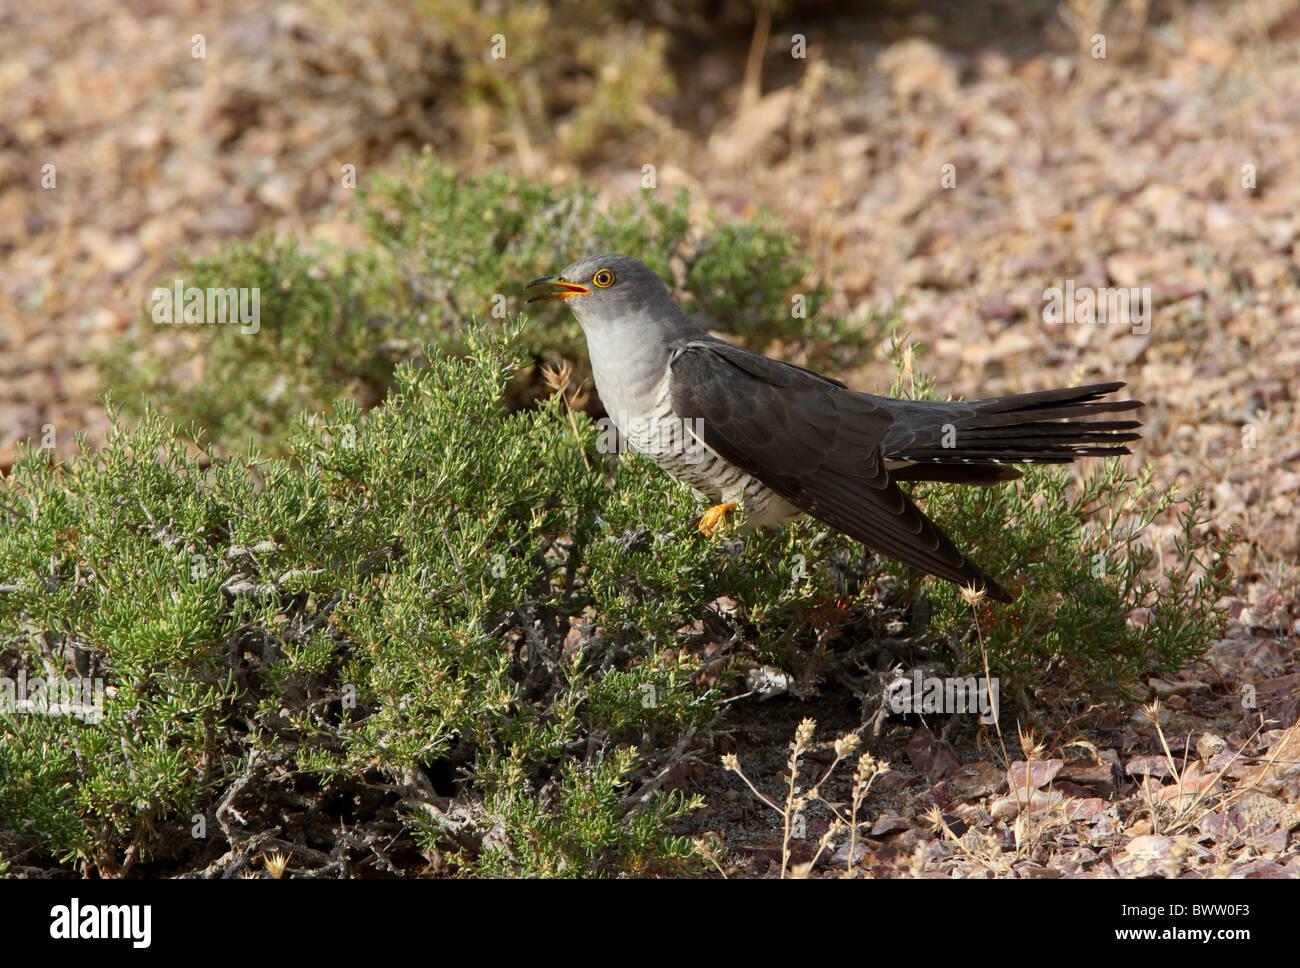 Common Cuckoo (Cuculus canorus) adult, calling, perched in low bush, Lake Balkhash, Kazakhstan, june - Stock Image